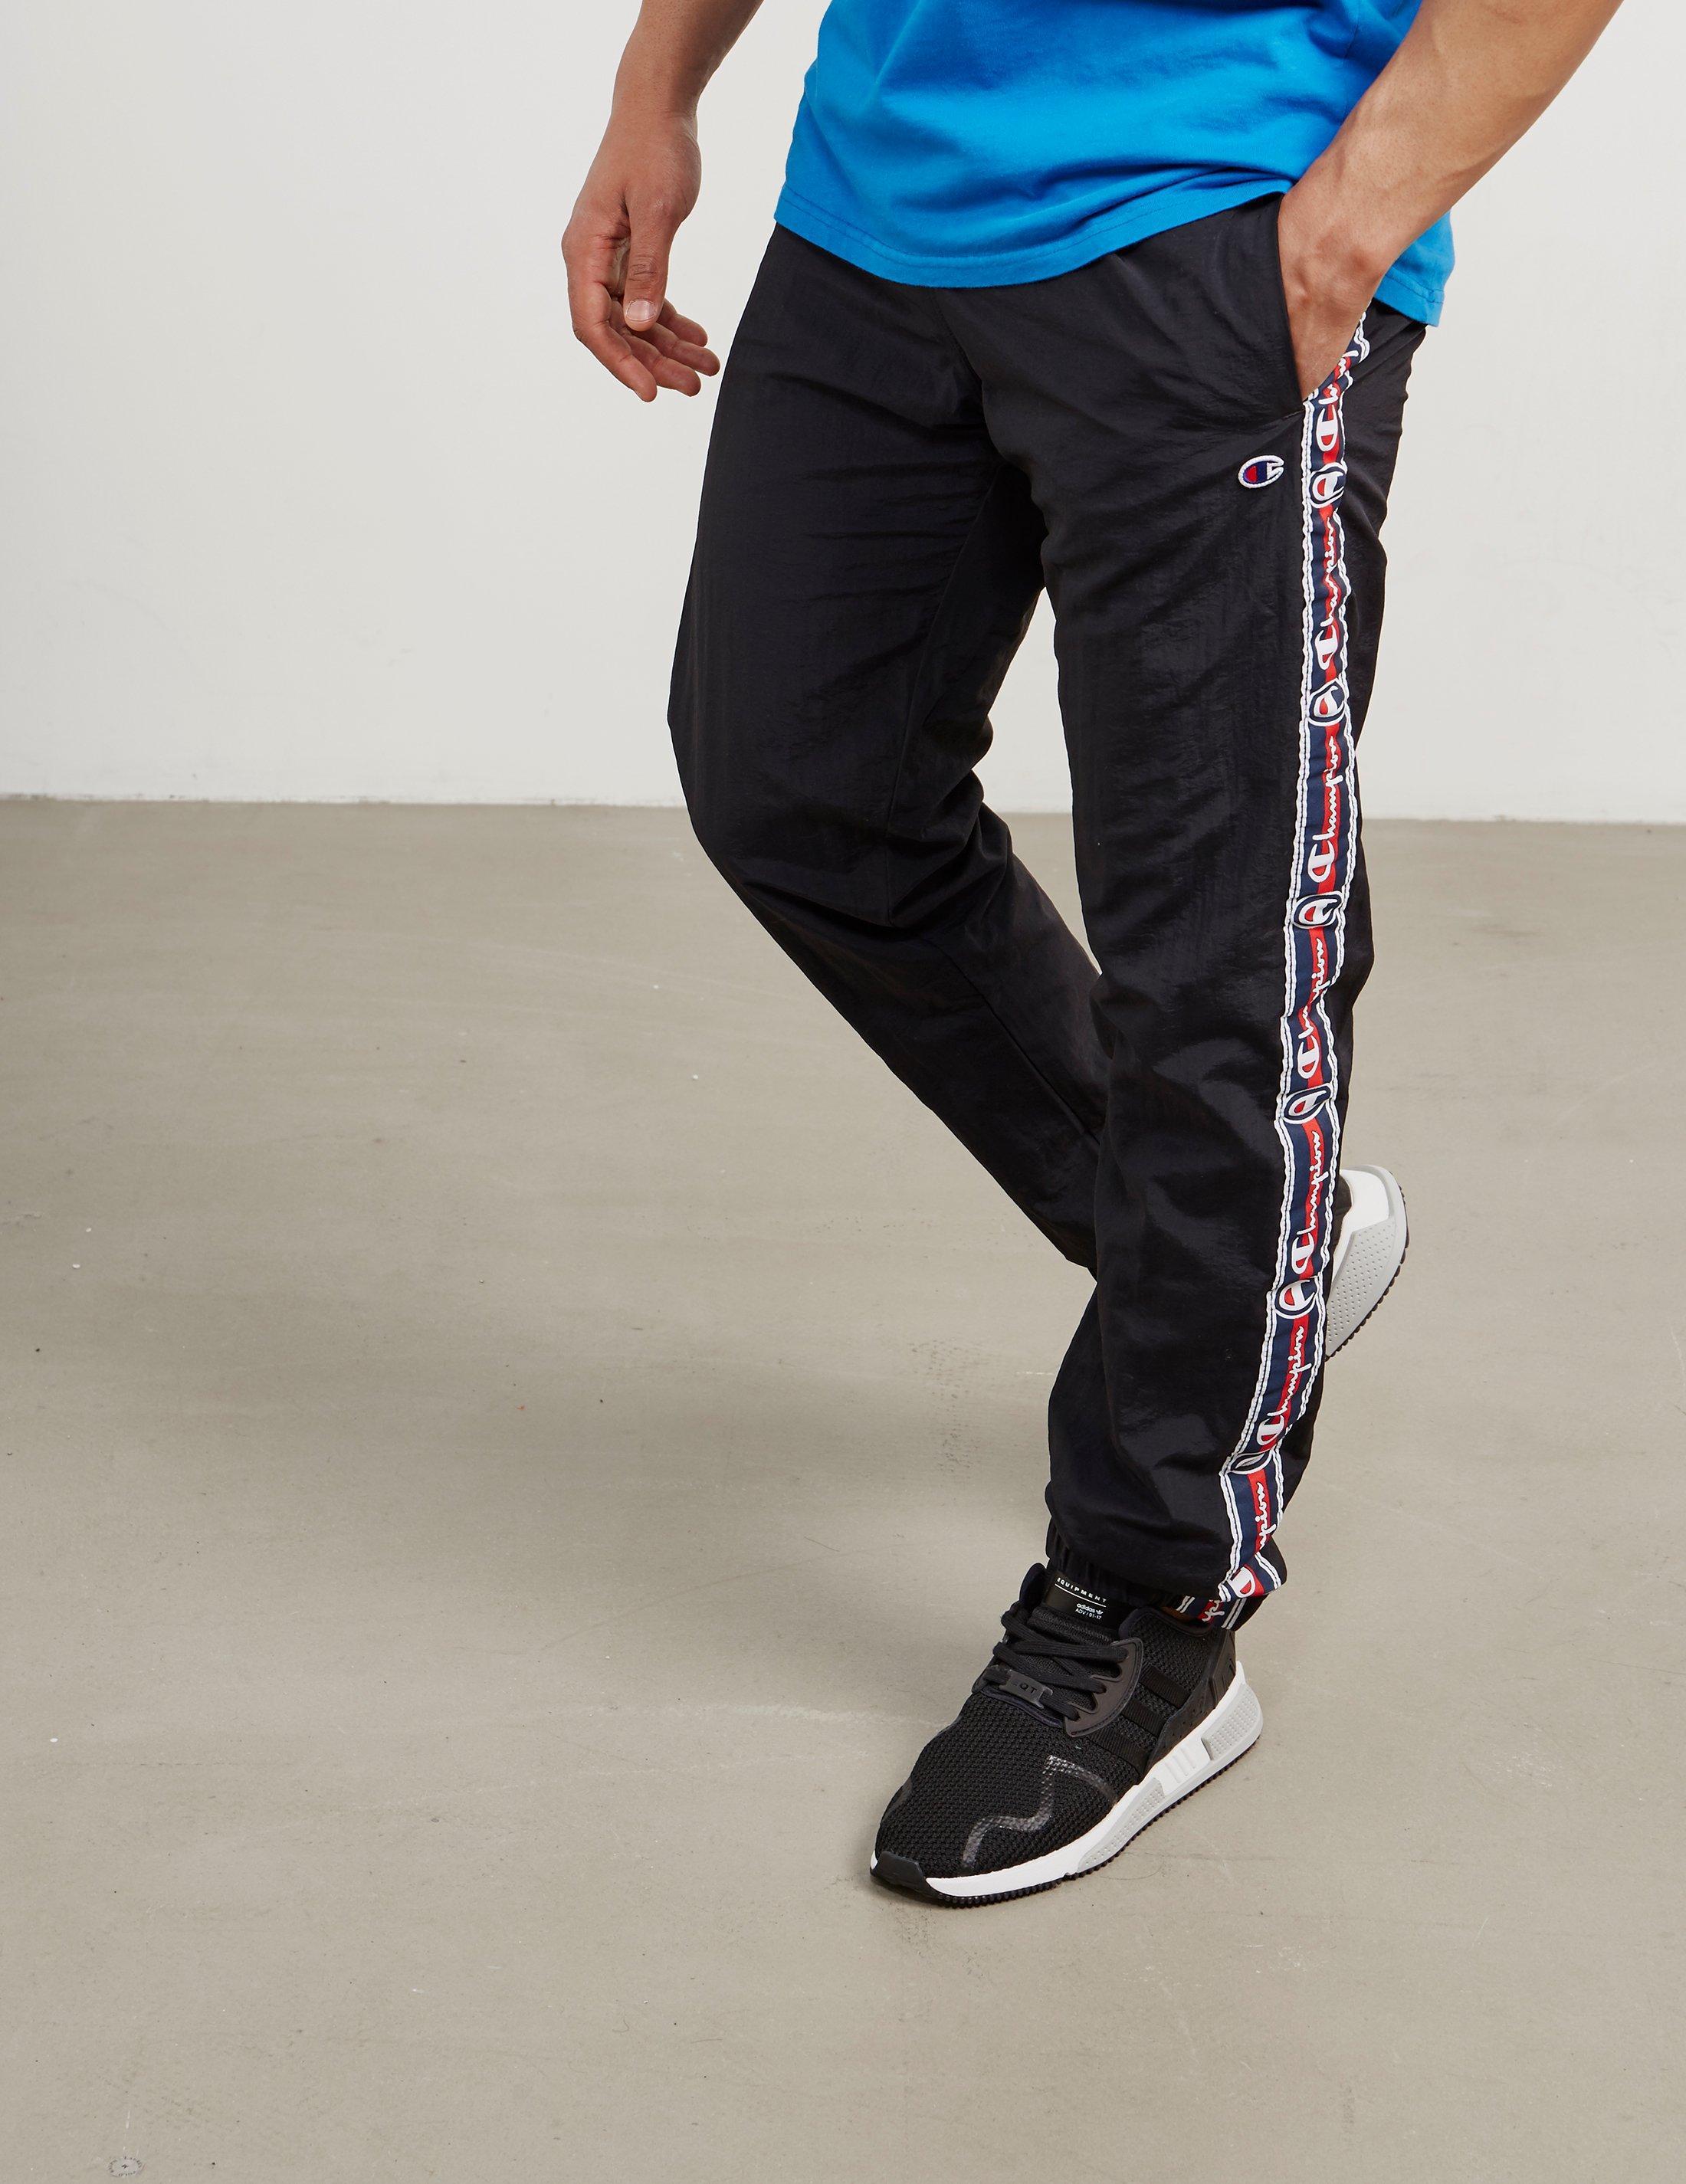 ad2970622be5 Lyst - Champion Mens Retro Tape Track Pants Black in Black for Men